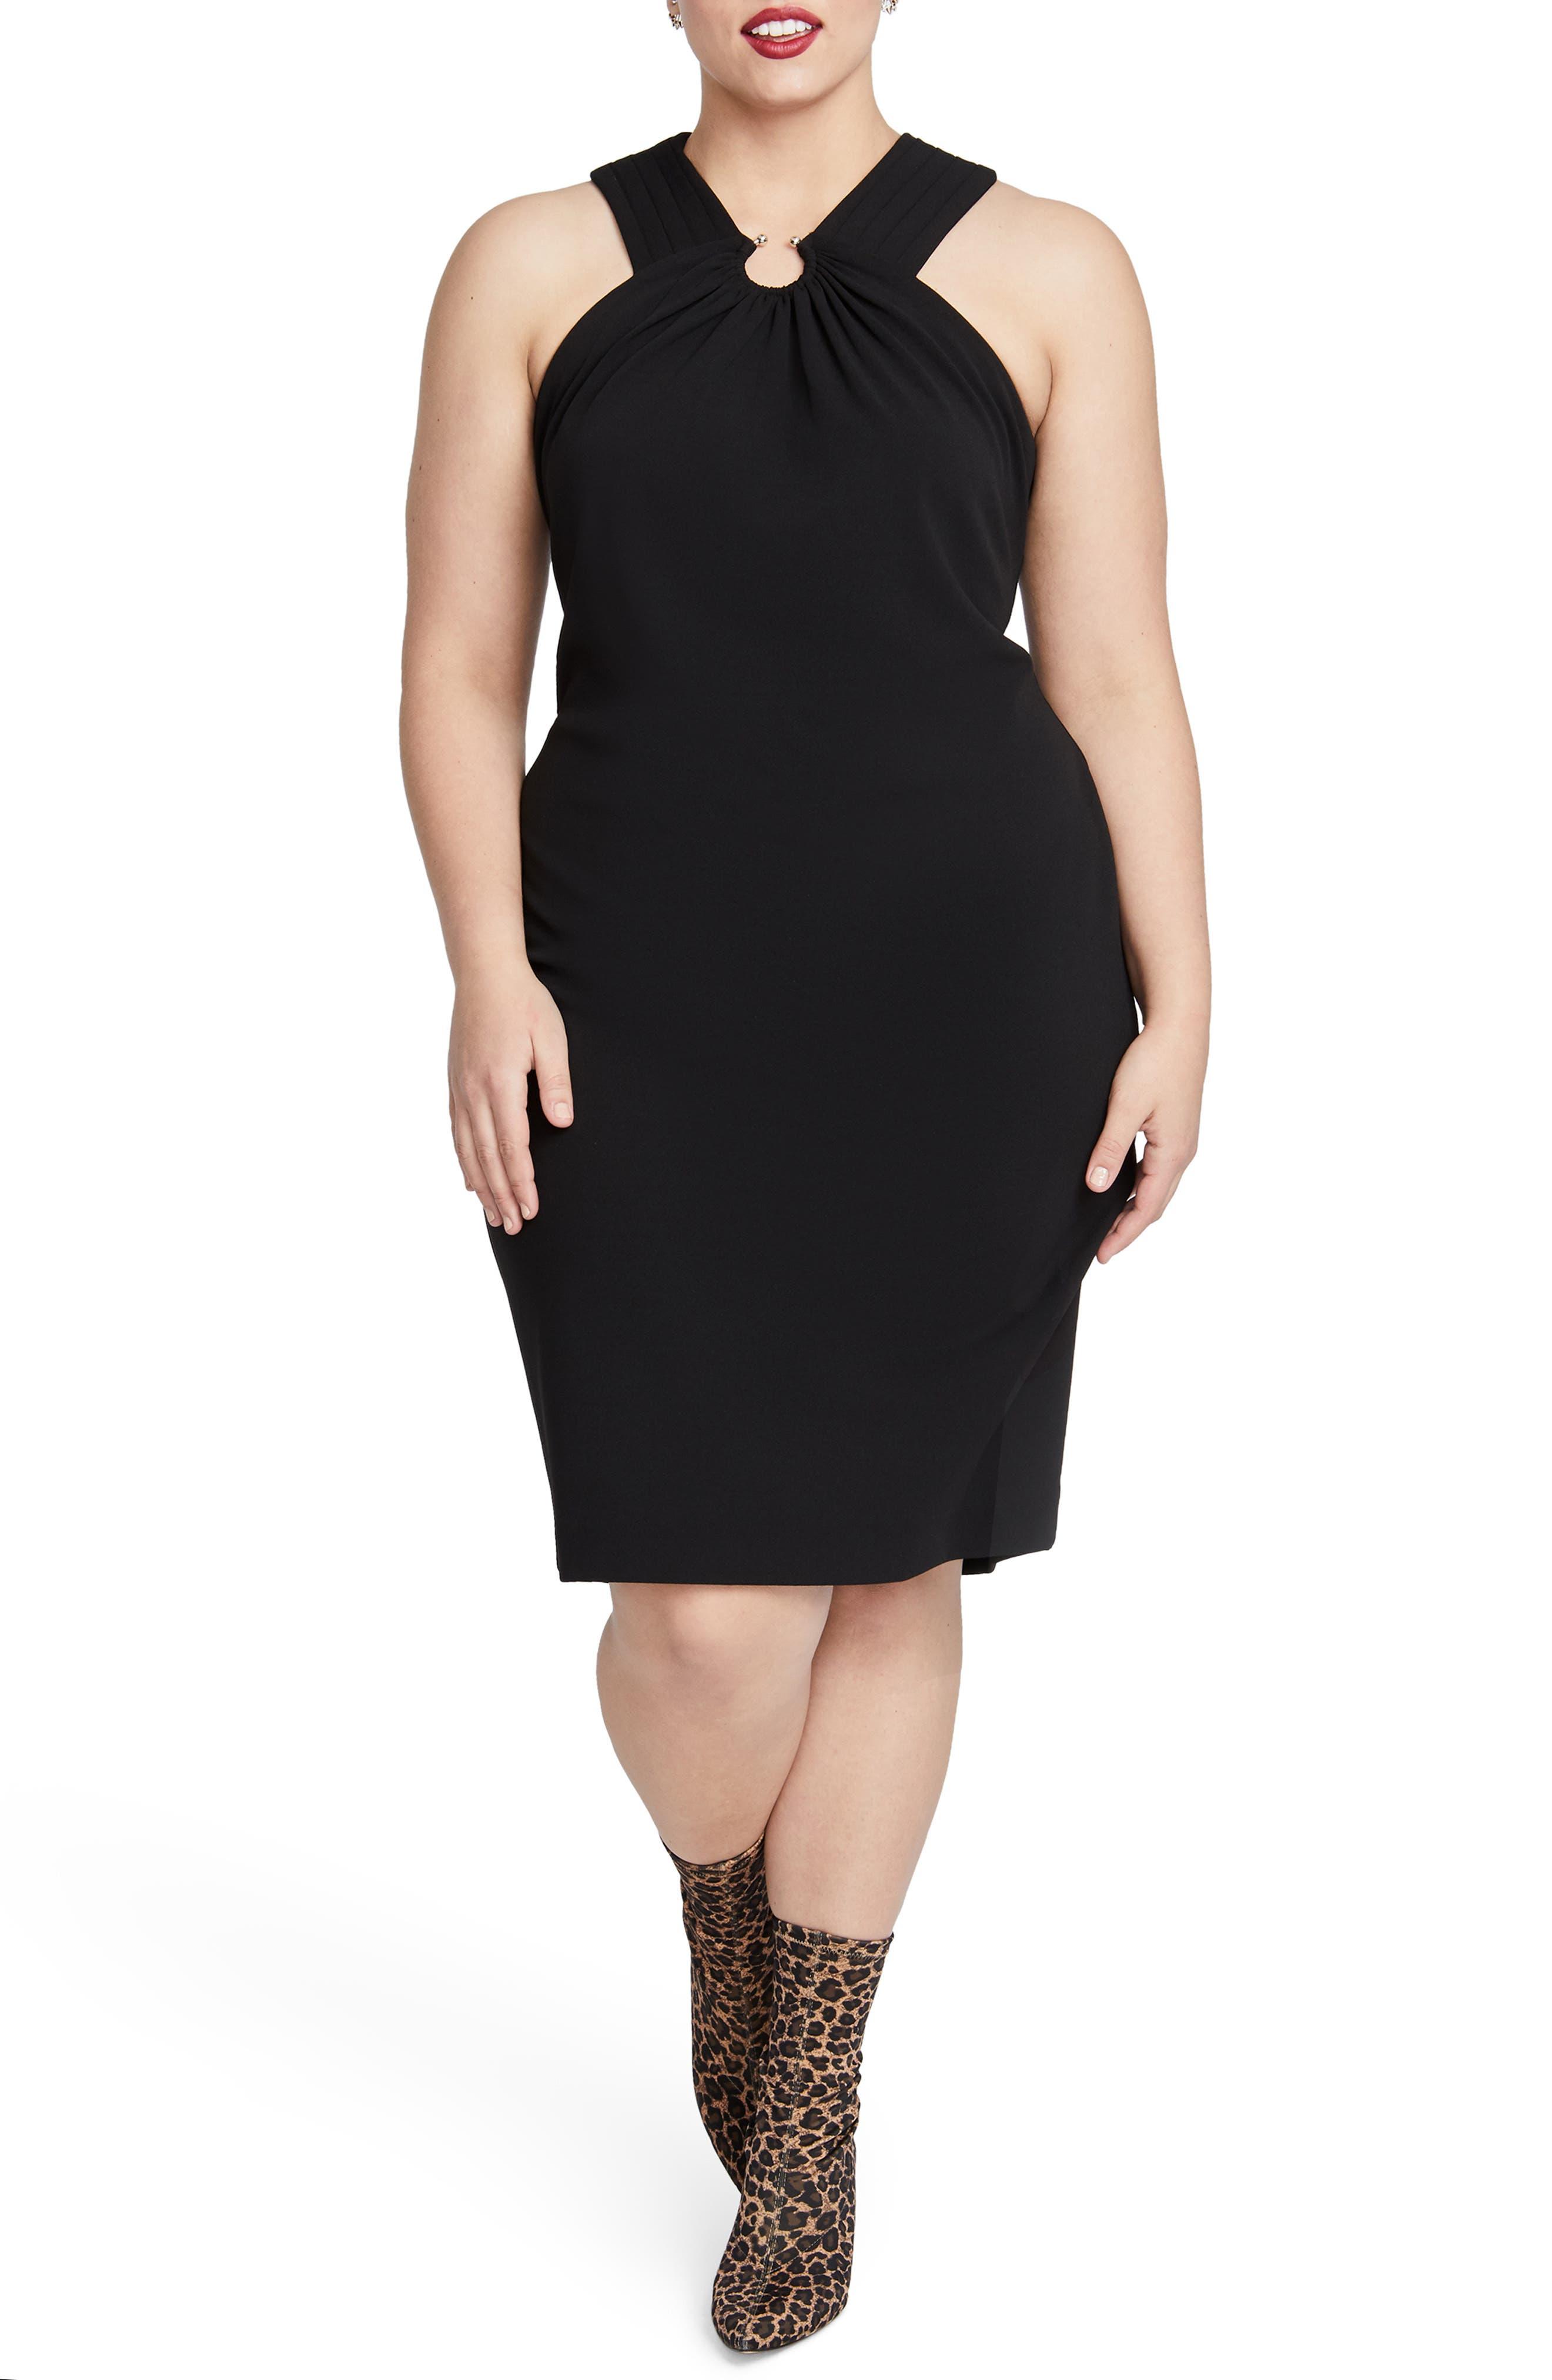 Plus Size Rachel Rachel Roy Prynn Sheath Dress, Black